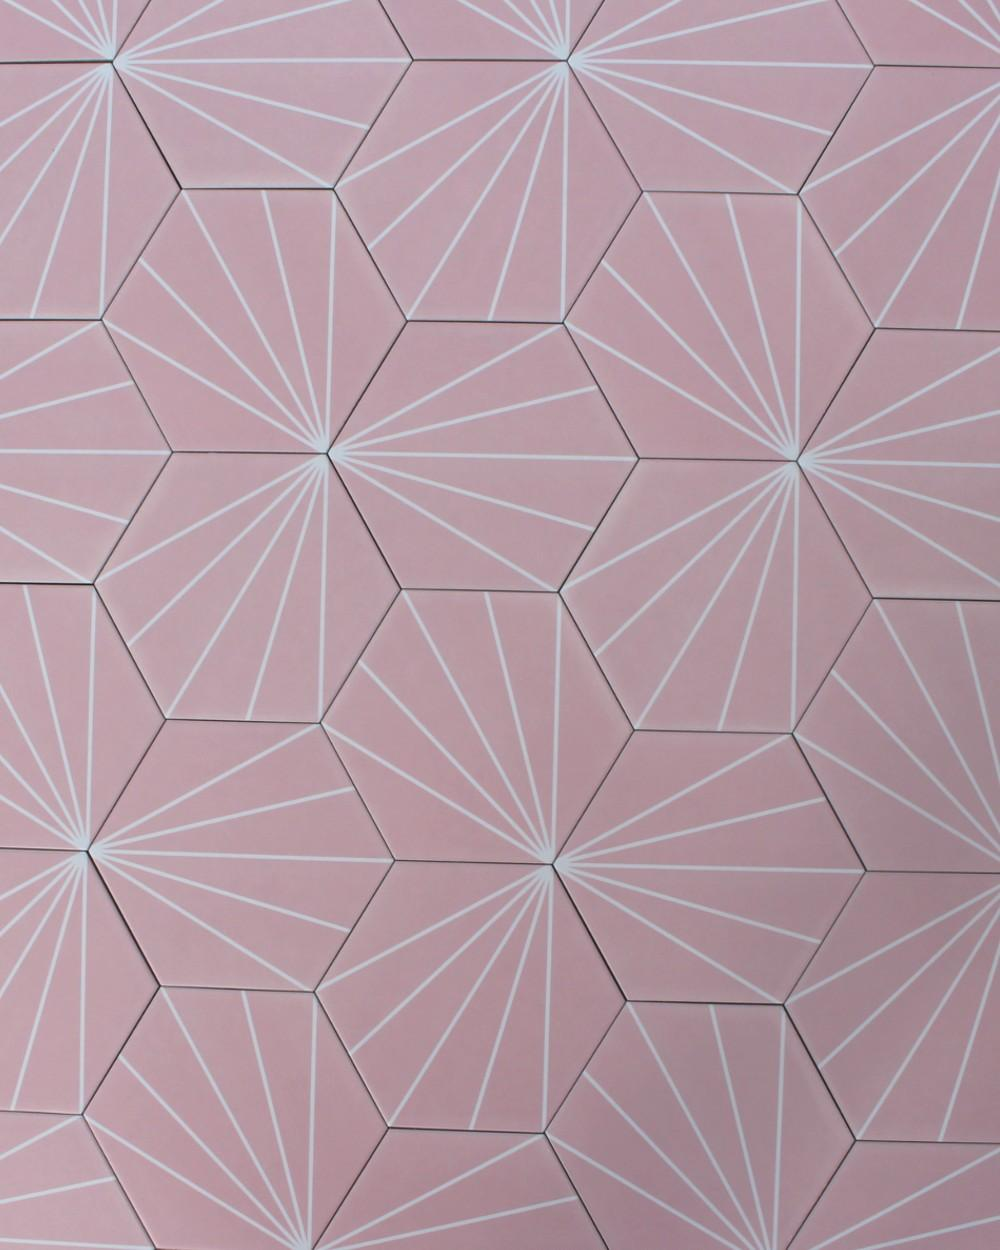 hexagon design tile stripes porcelain stoneware pink tile online shop